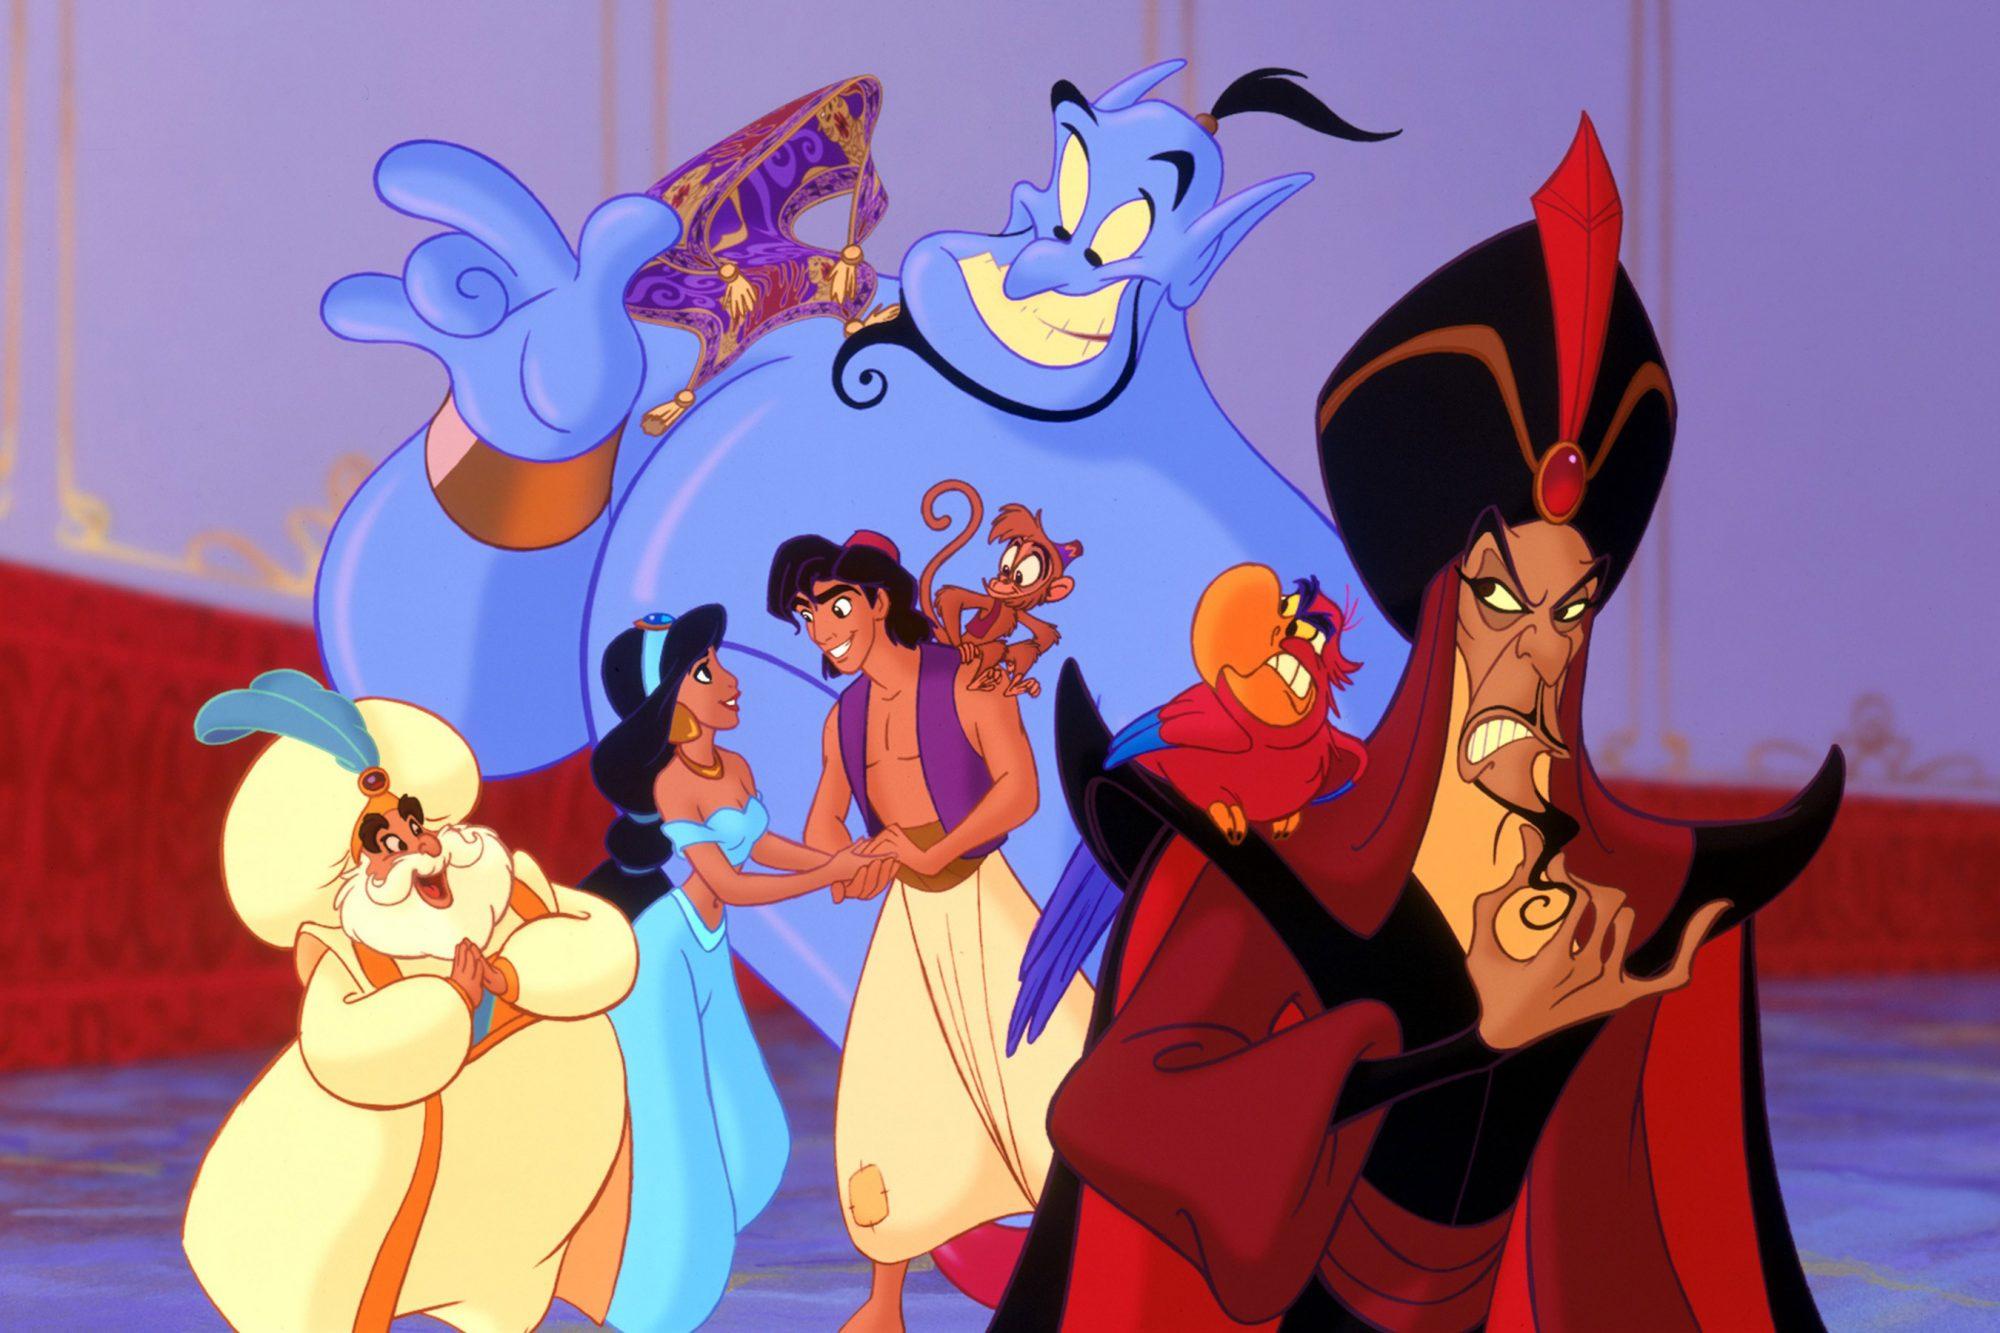 ALADDIN, Sultan, Genie, Jasmine, Aladdin, Abu, Iago, Jafar, 1992. (c) Buena Vista Pictures/ Courtesy